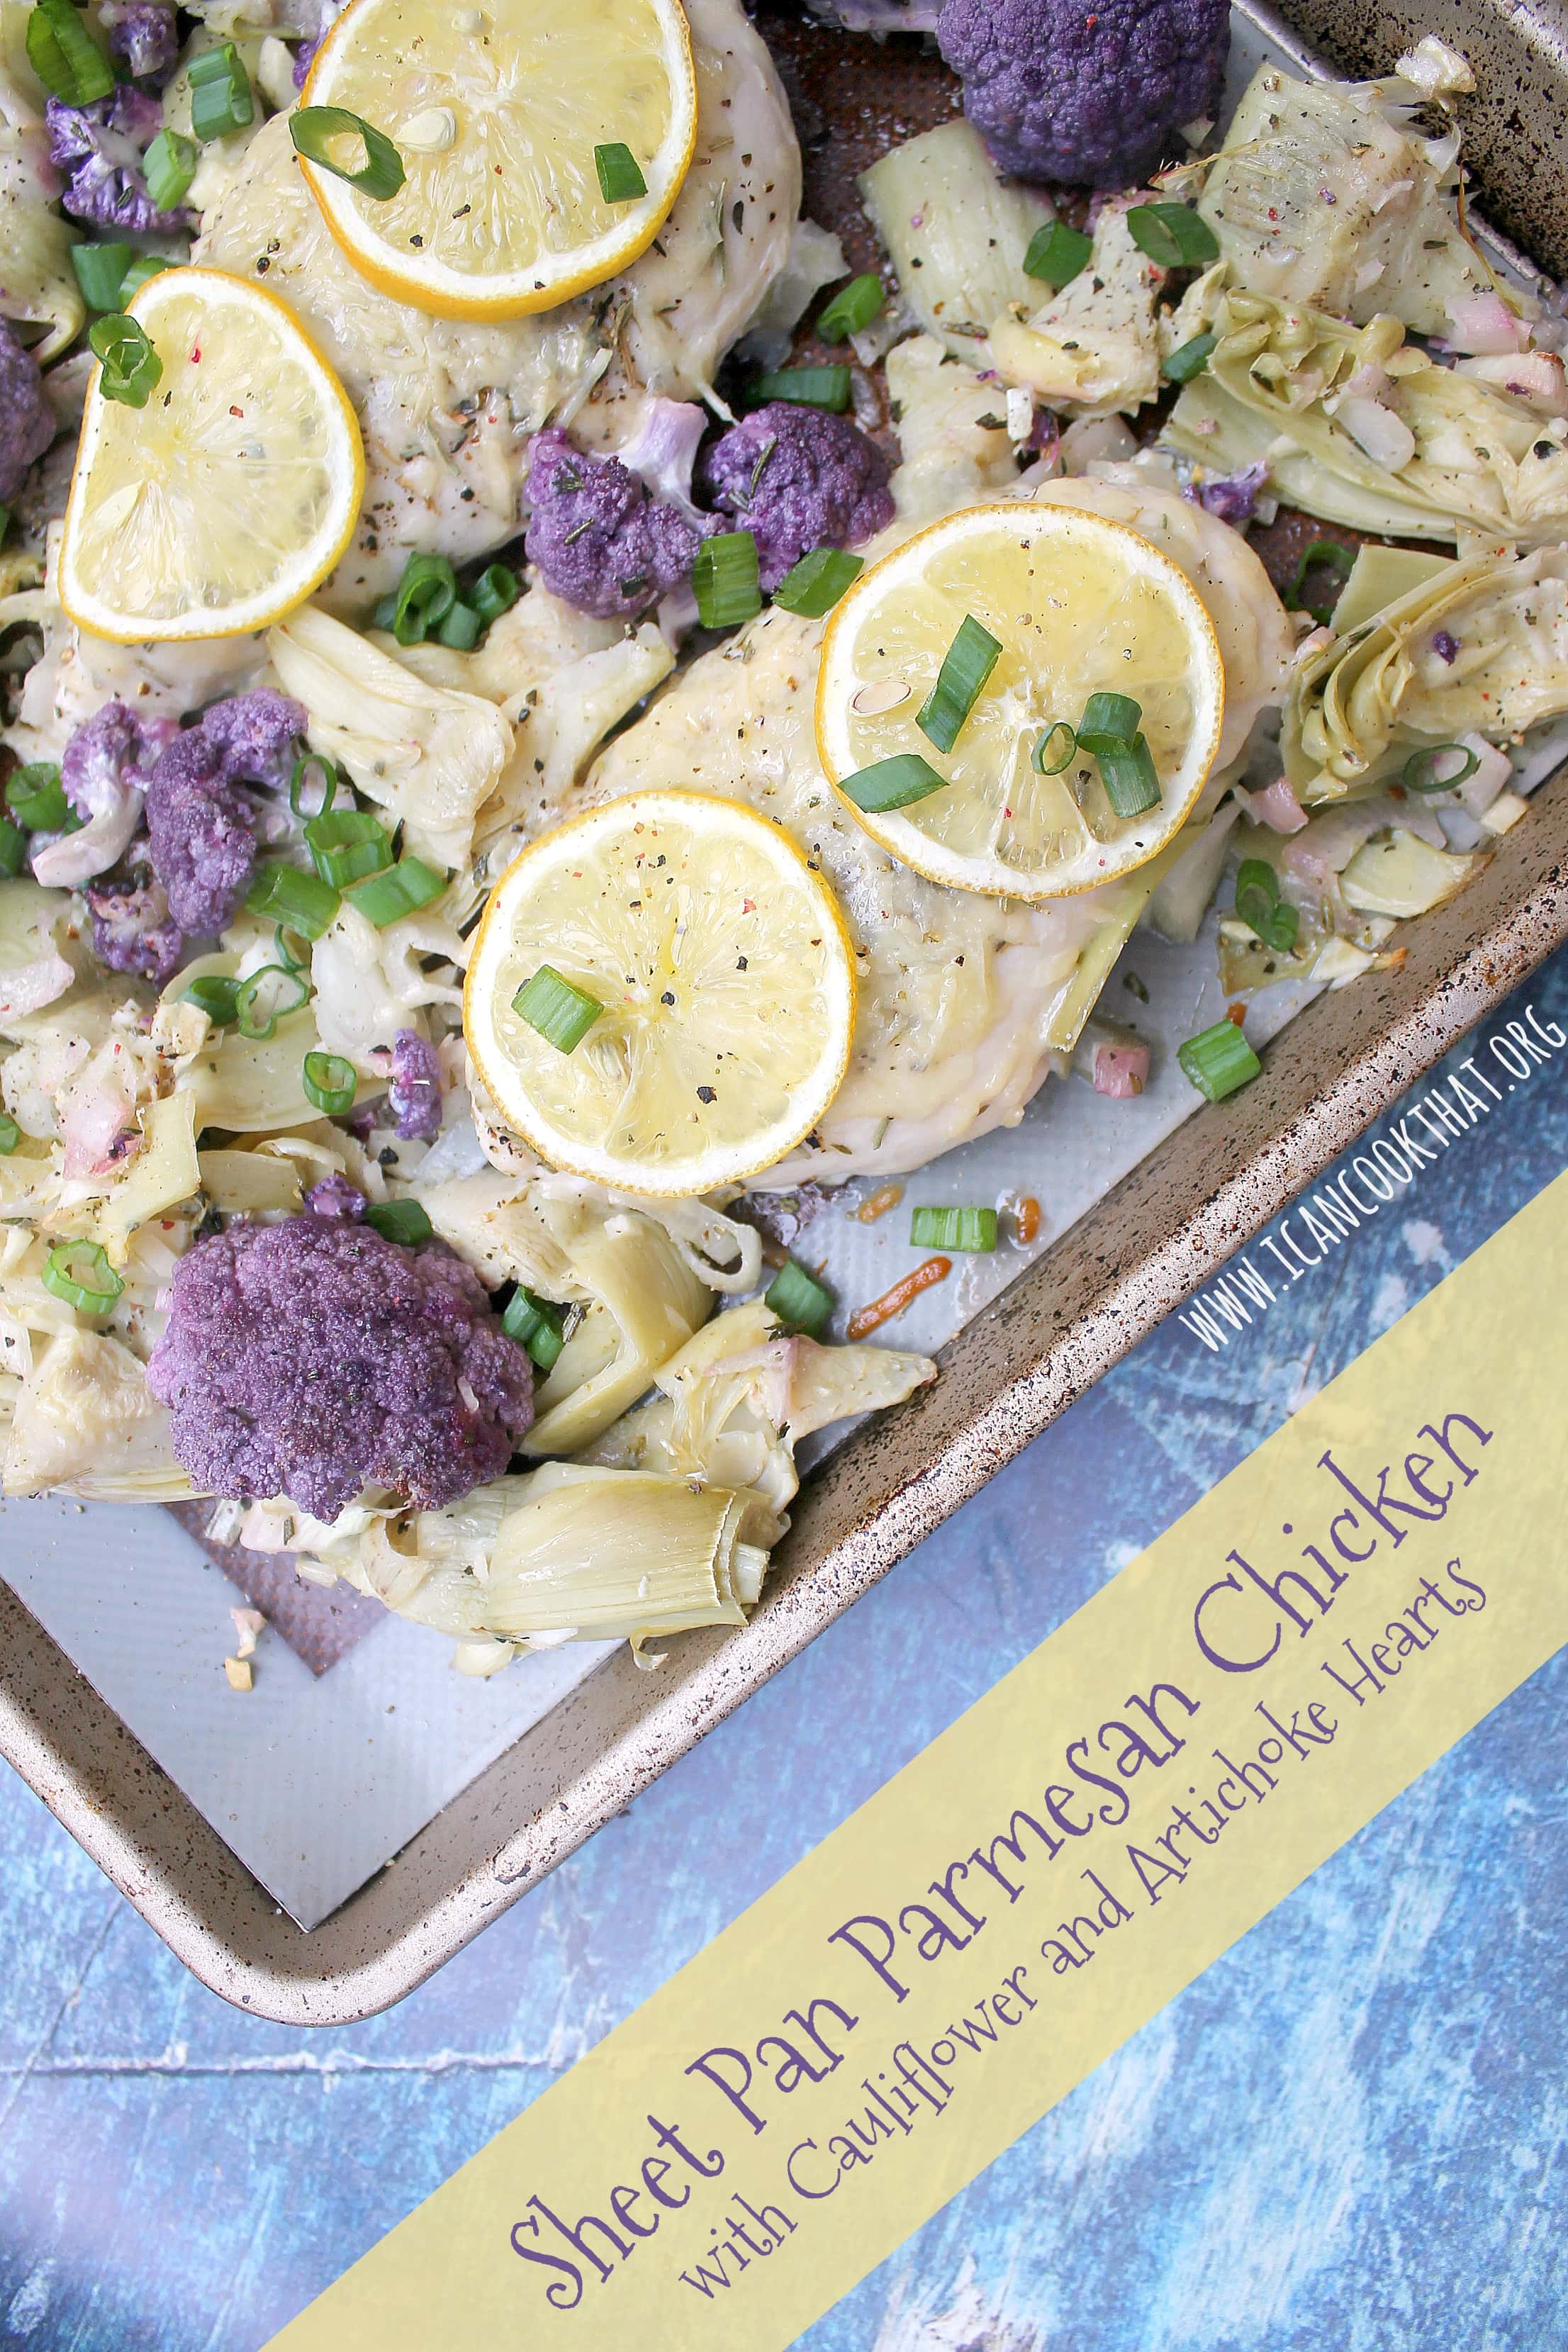 Sheet Pan Parmesan Chicken with Cauliflower and Artichoke Hearts